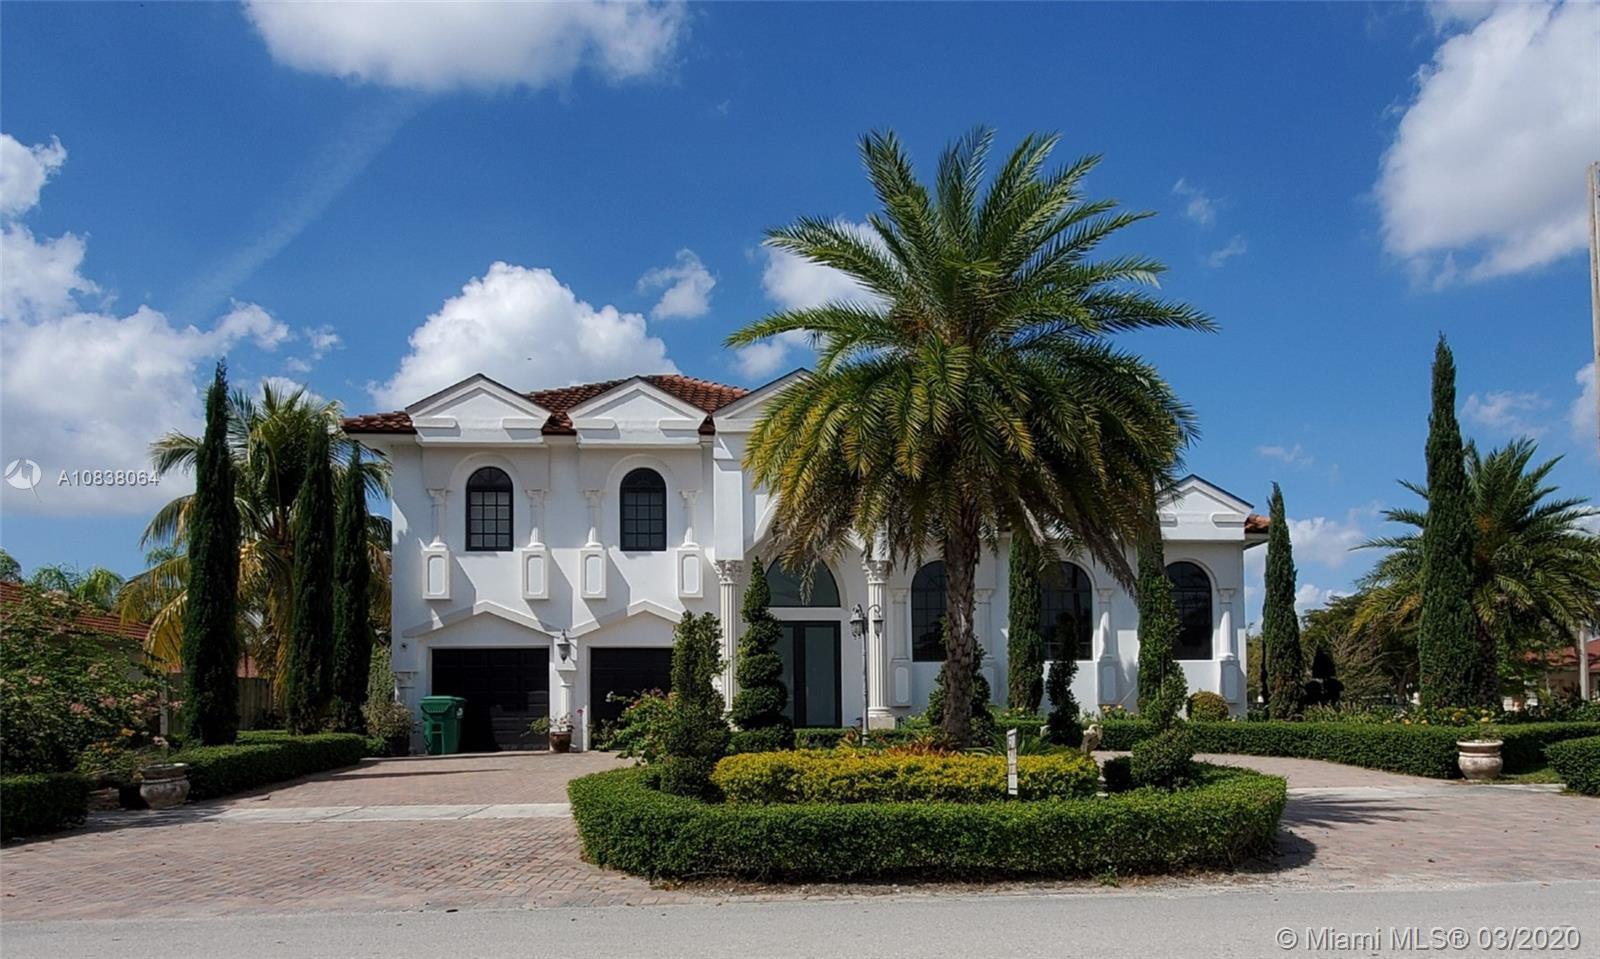 20020 SW 132nd Ave, Miami, FL 33177